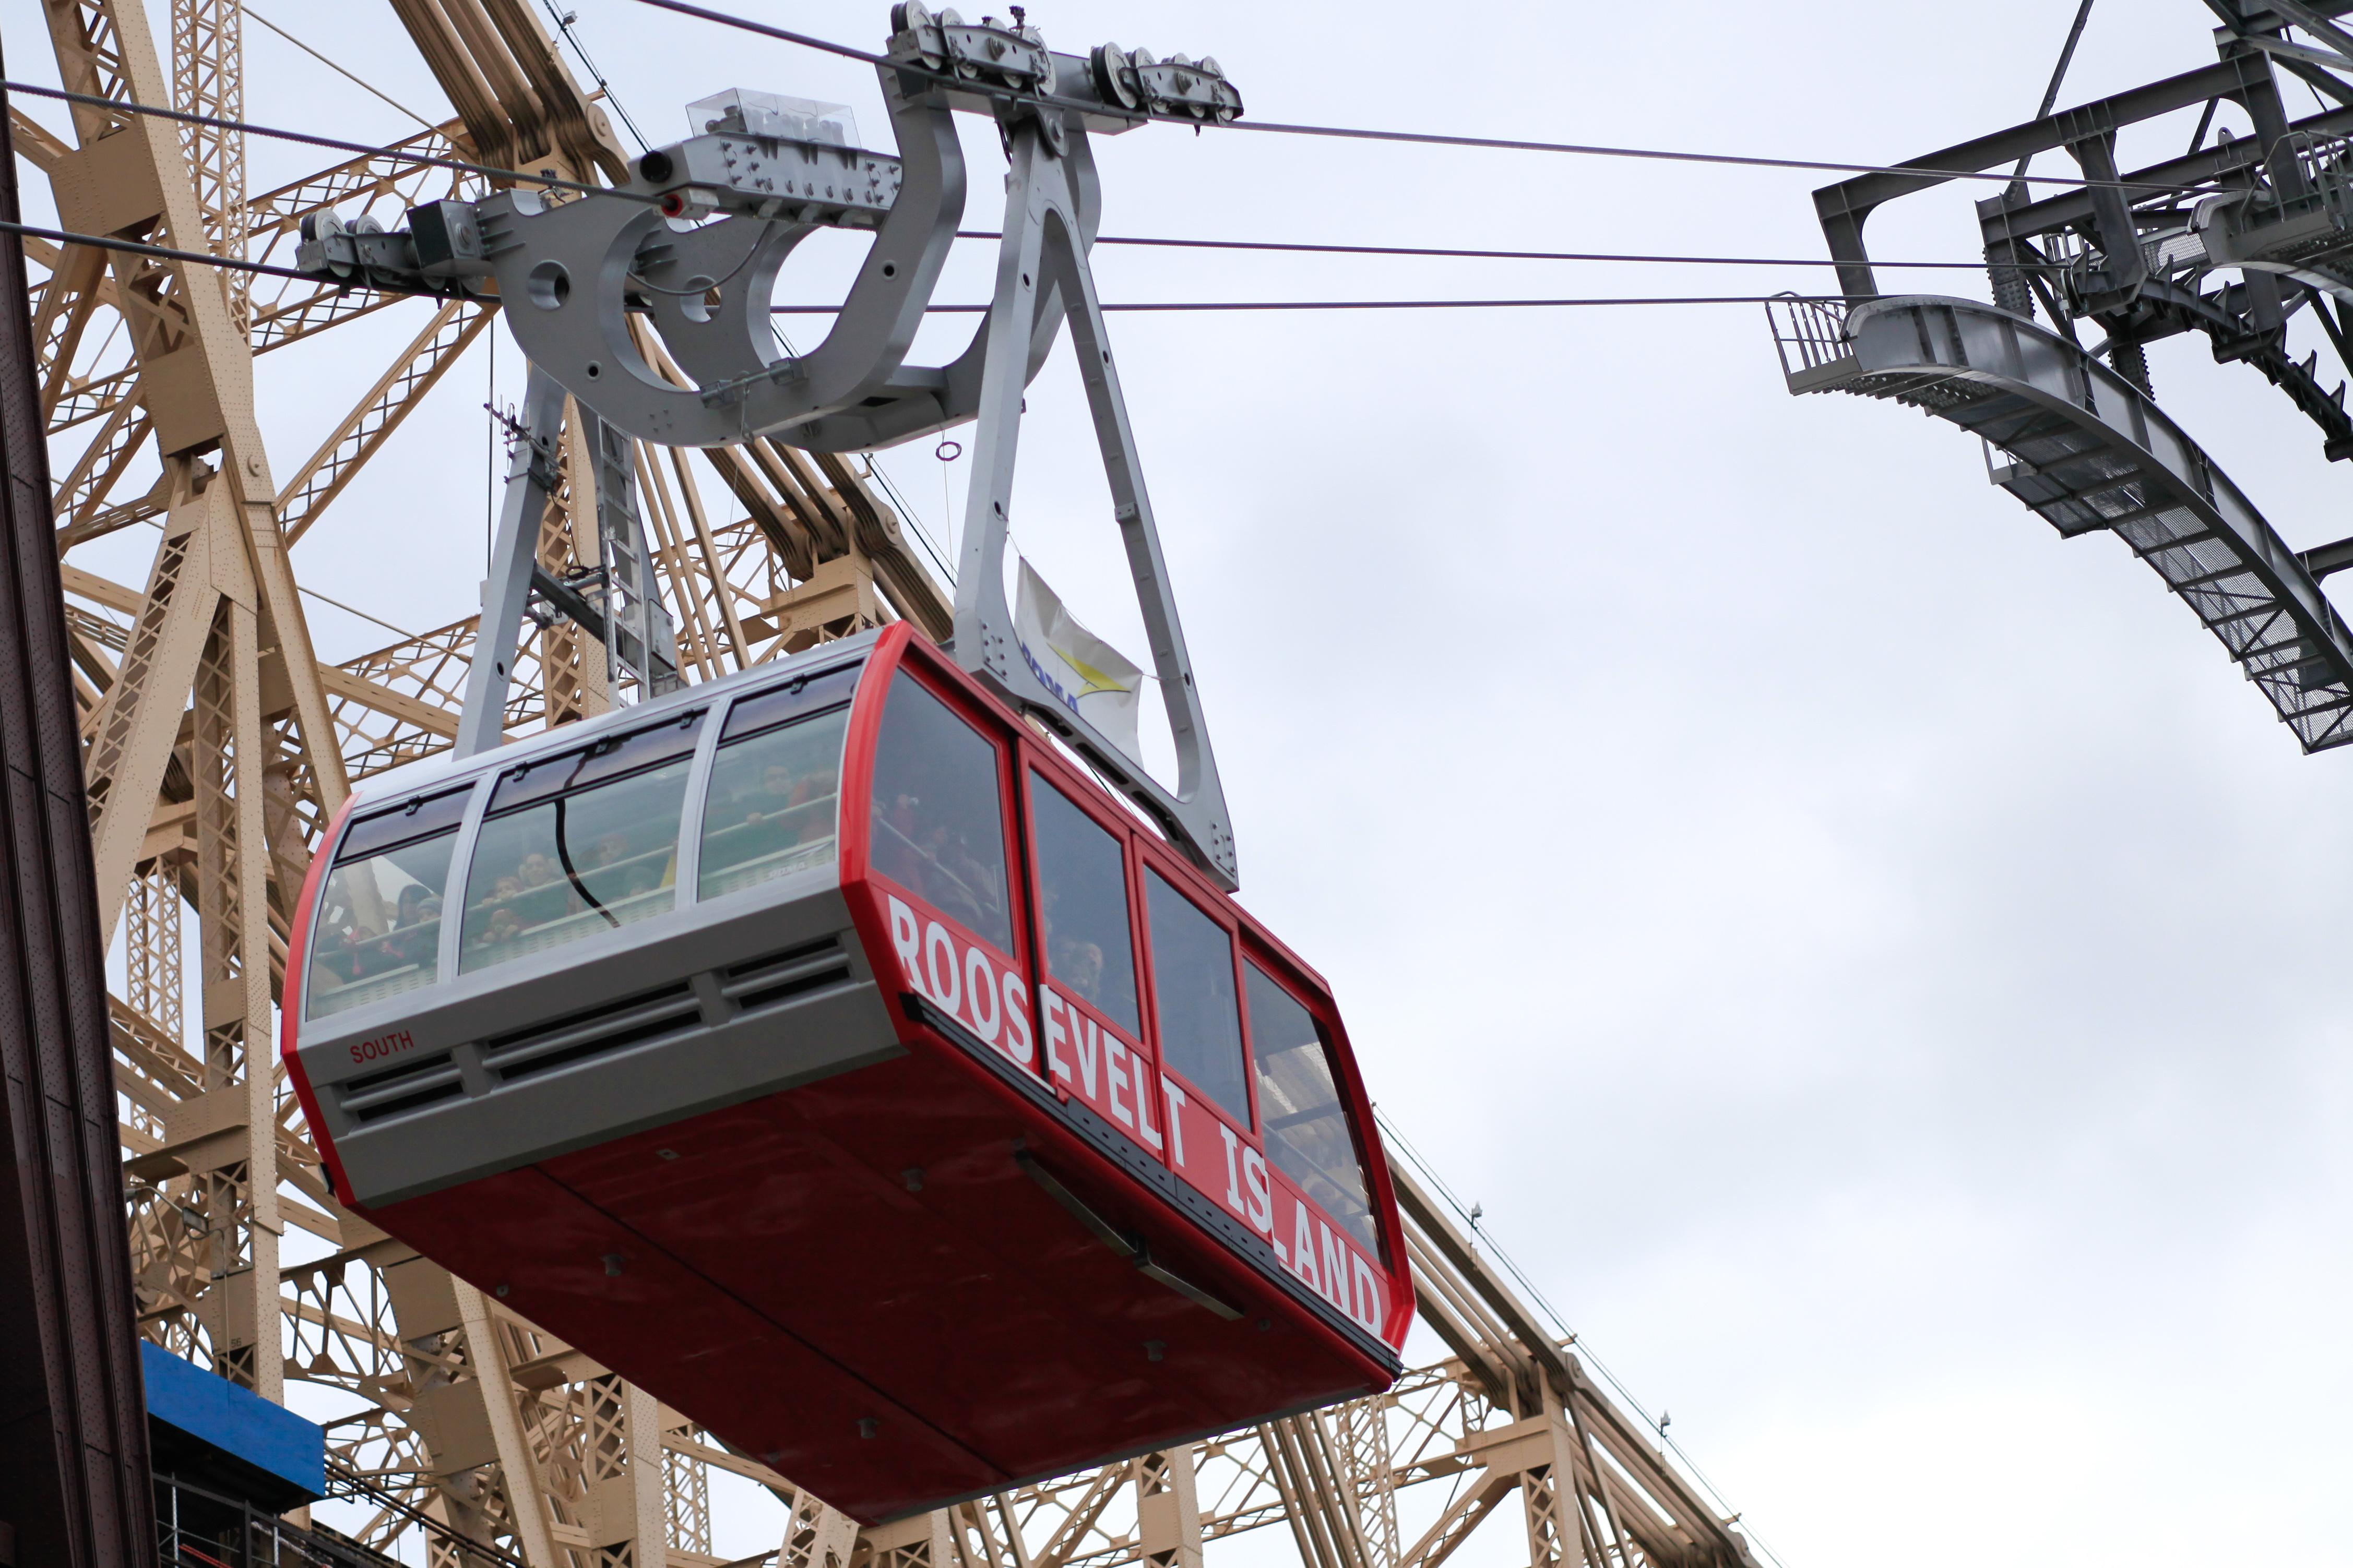 Roosevelt_Island_tramcar_2010.jpg